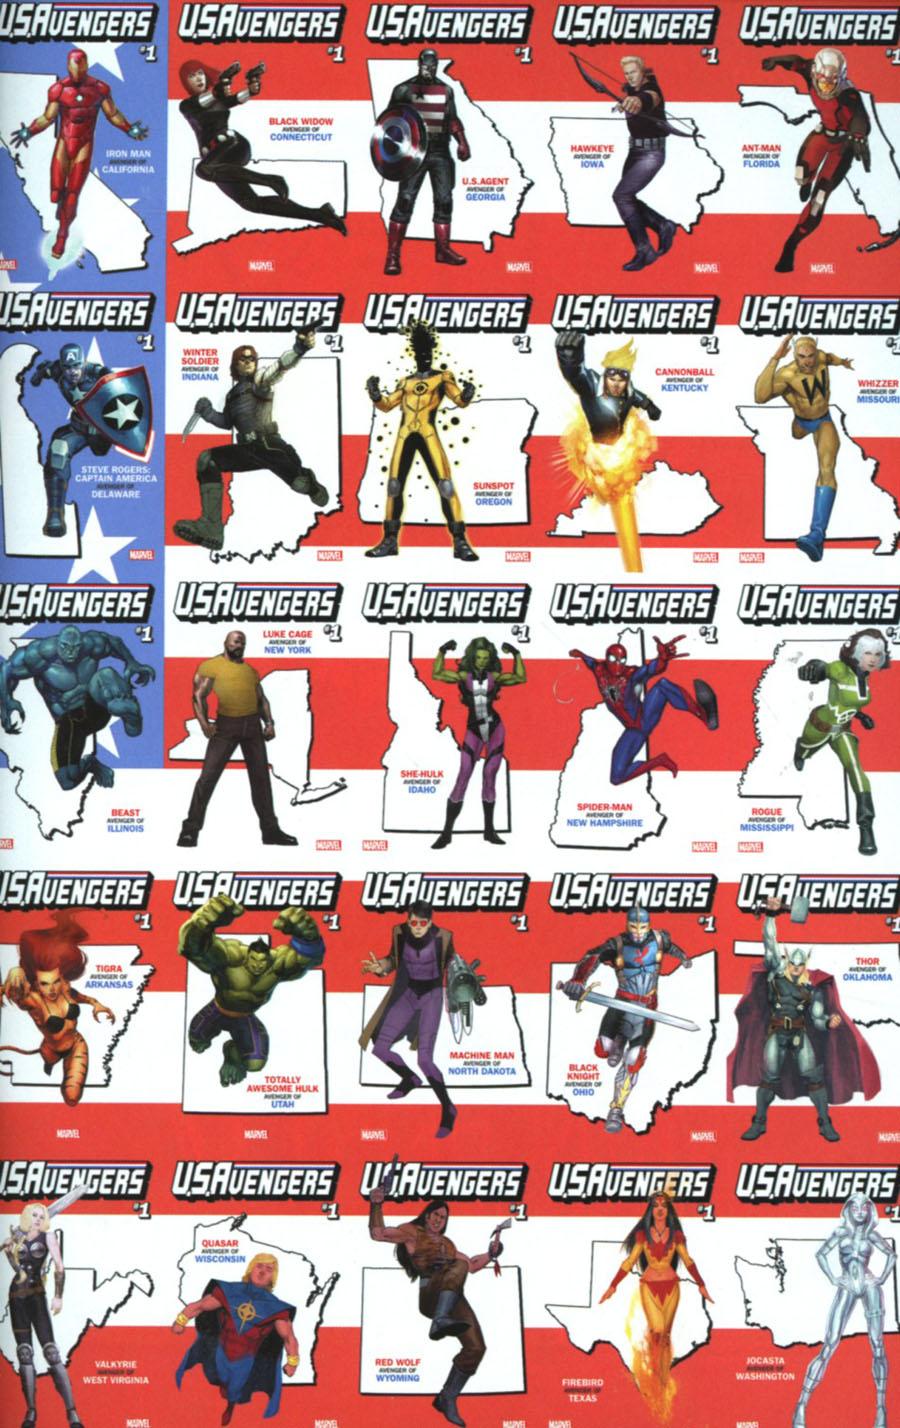 U.S.Avengers #1 Cover Z-Z-M Incentive Retailer Bonus Variant Cover